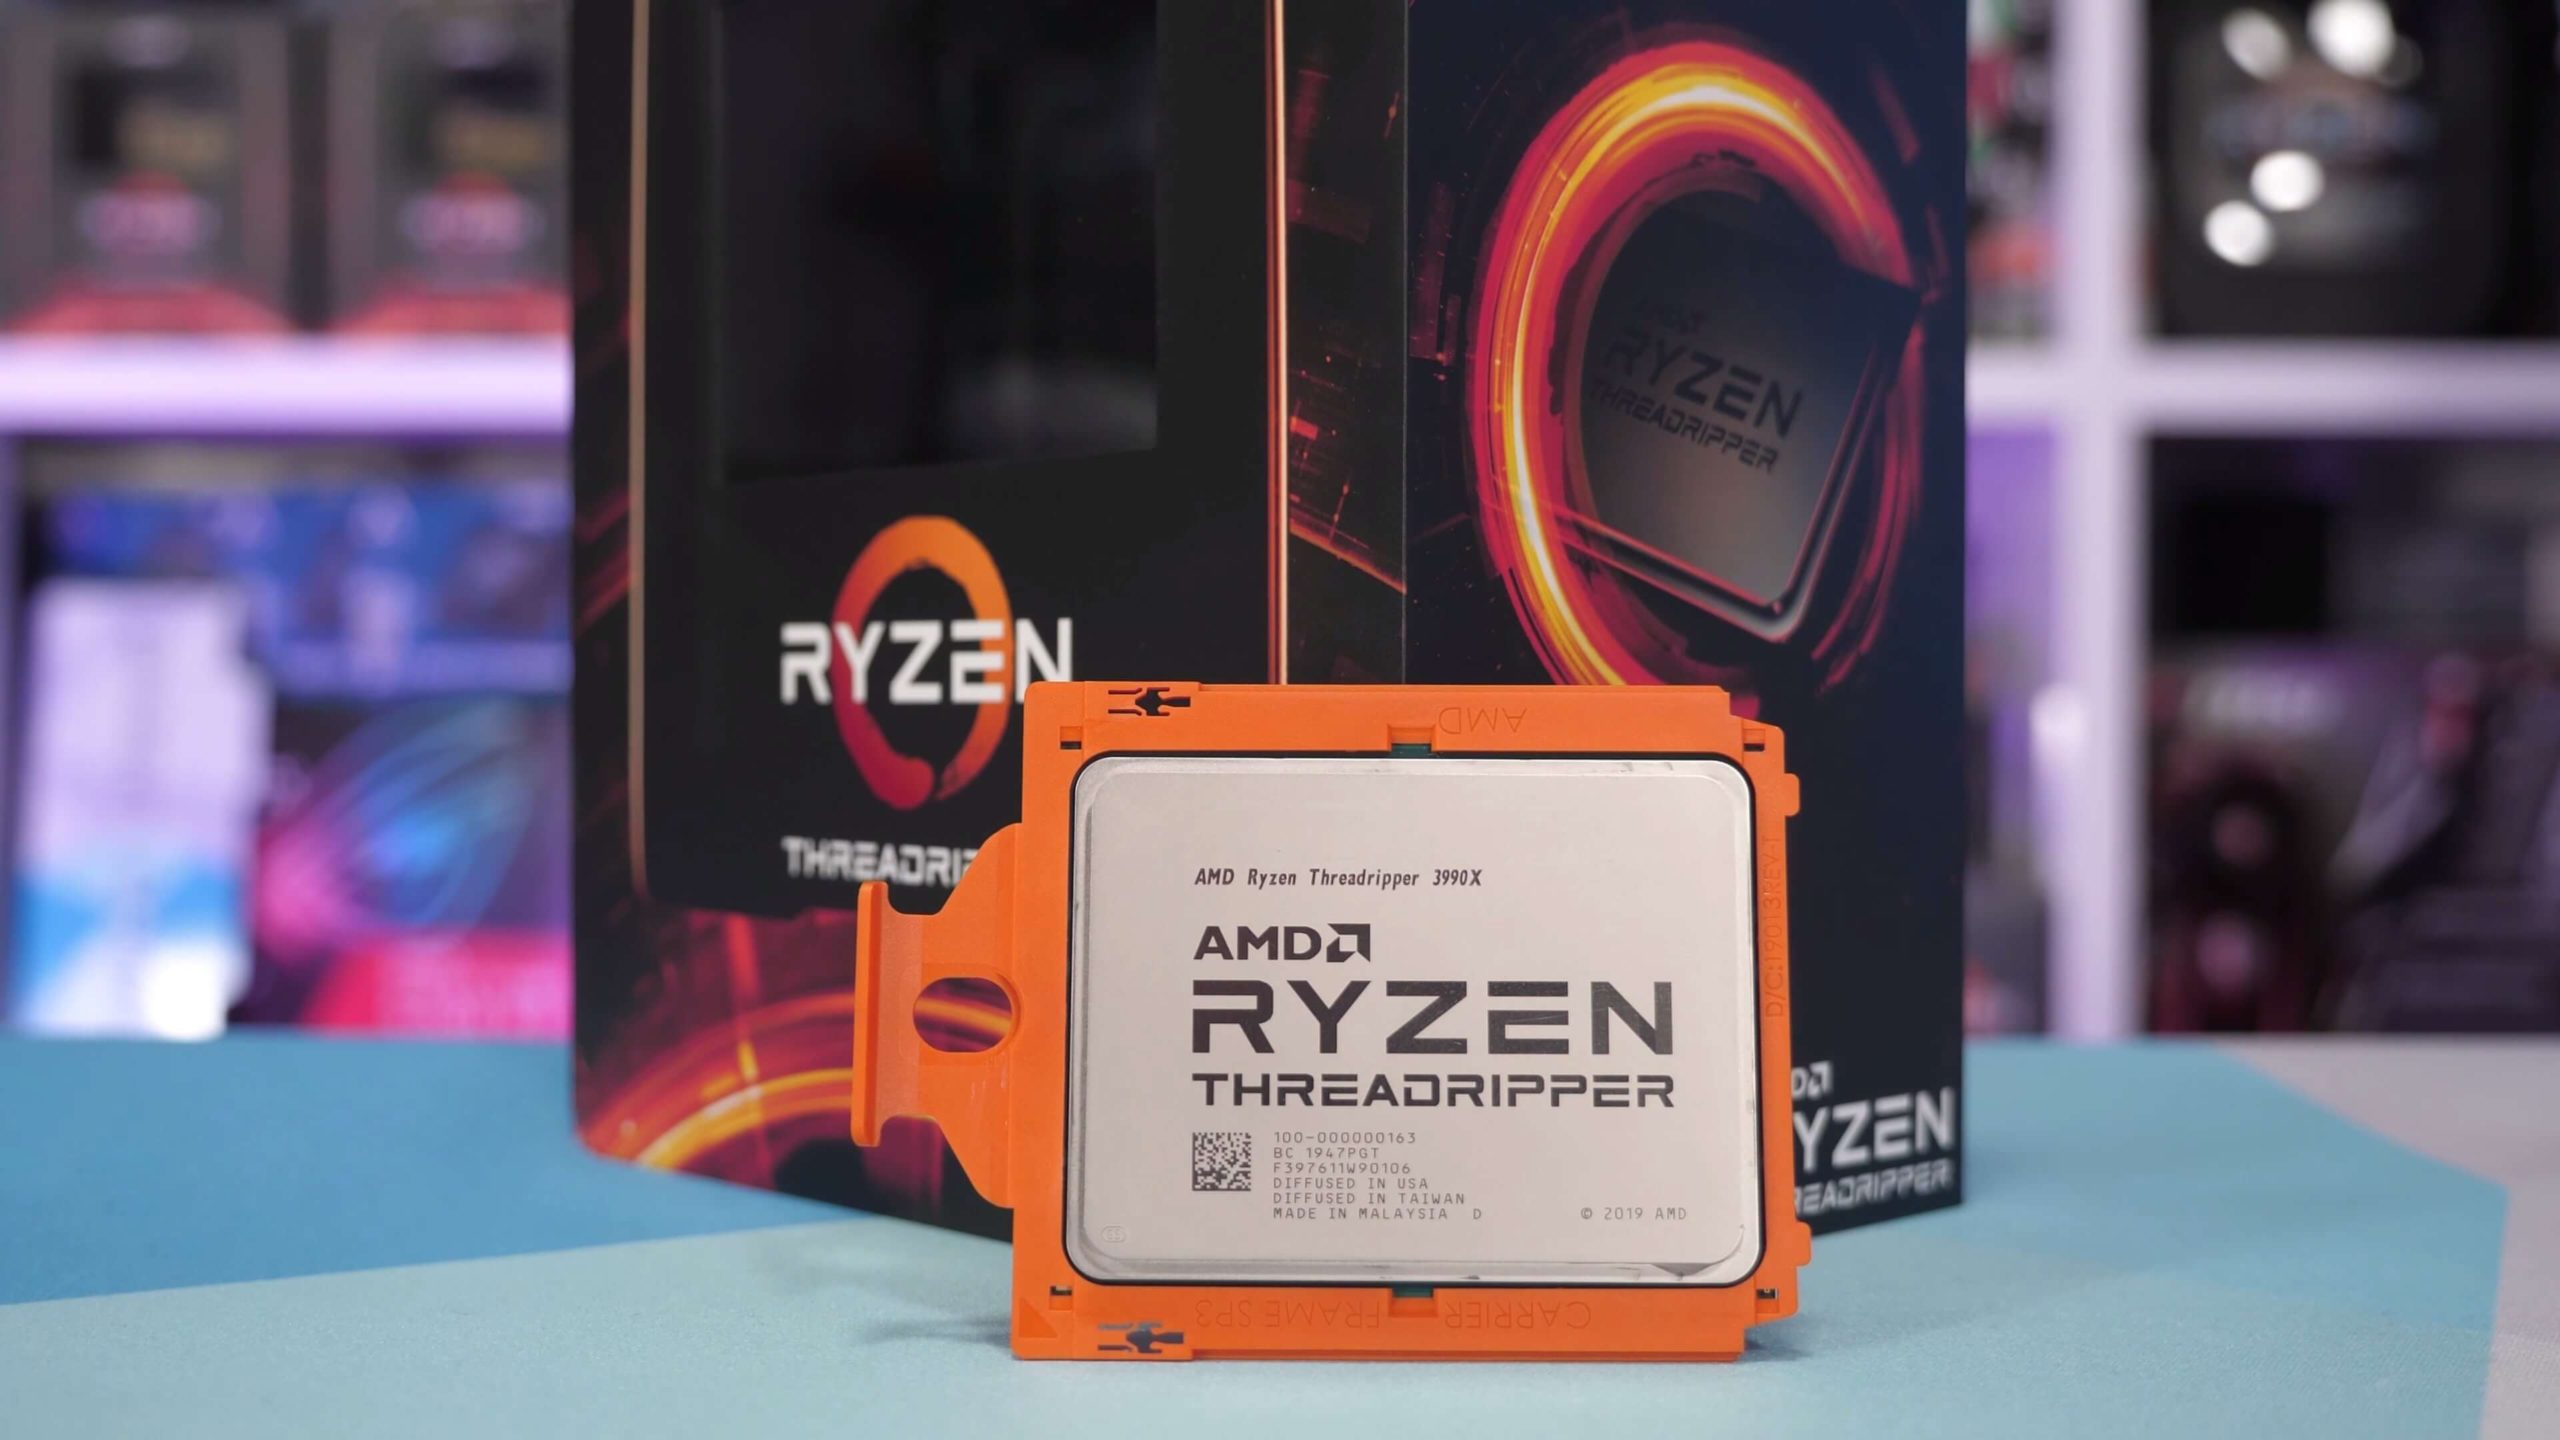 AMD Ryzen Threadripper 3990X overclock